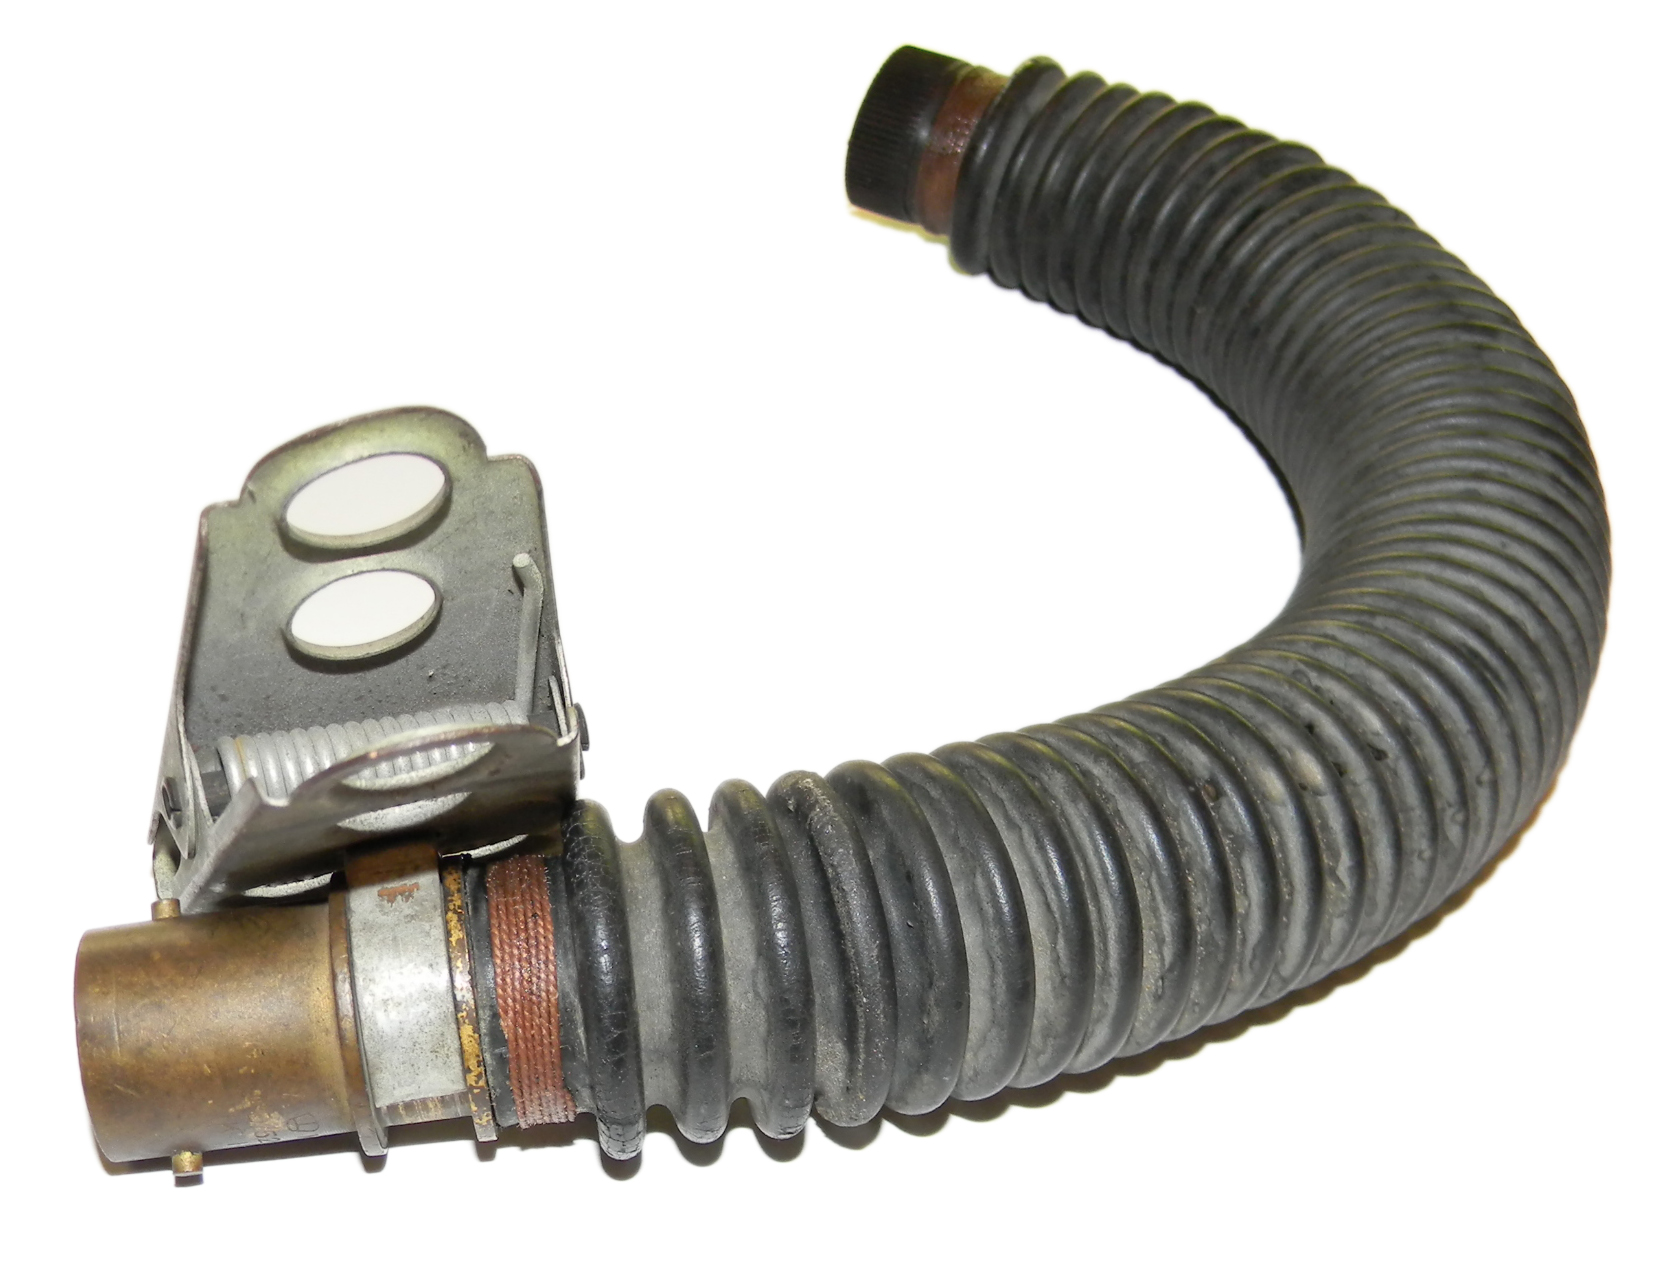 WWII RAF oxygen mask hose